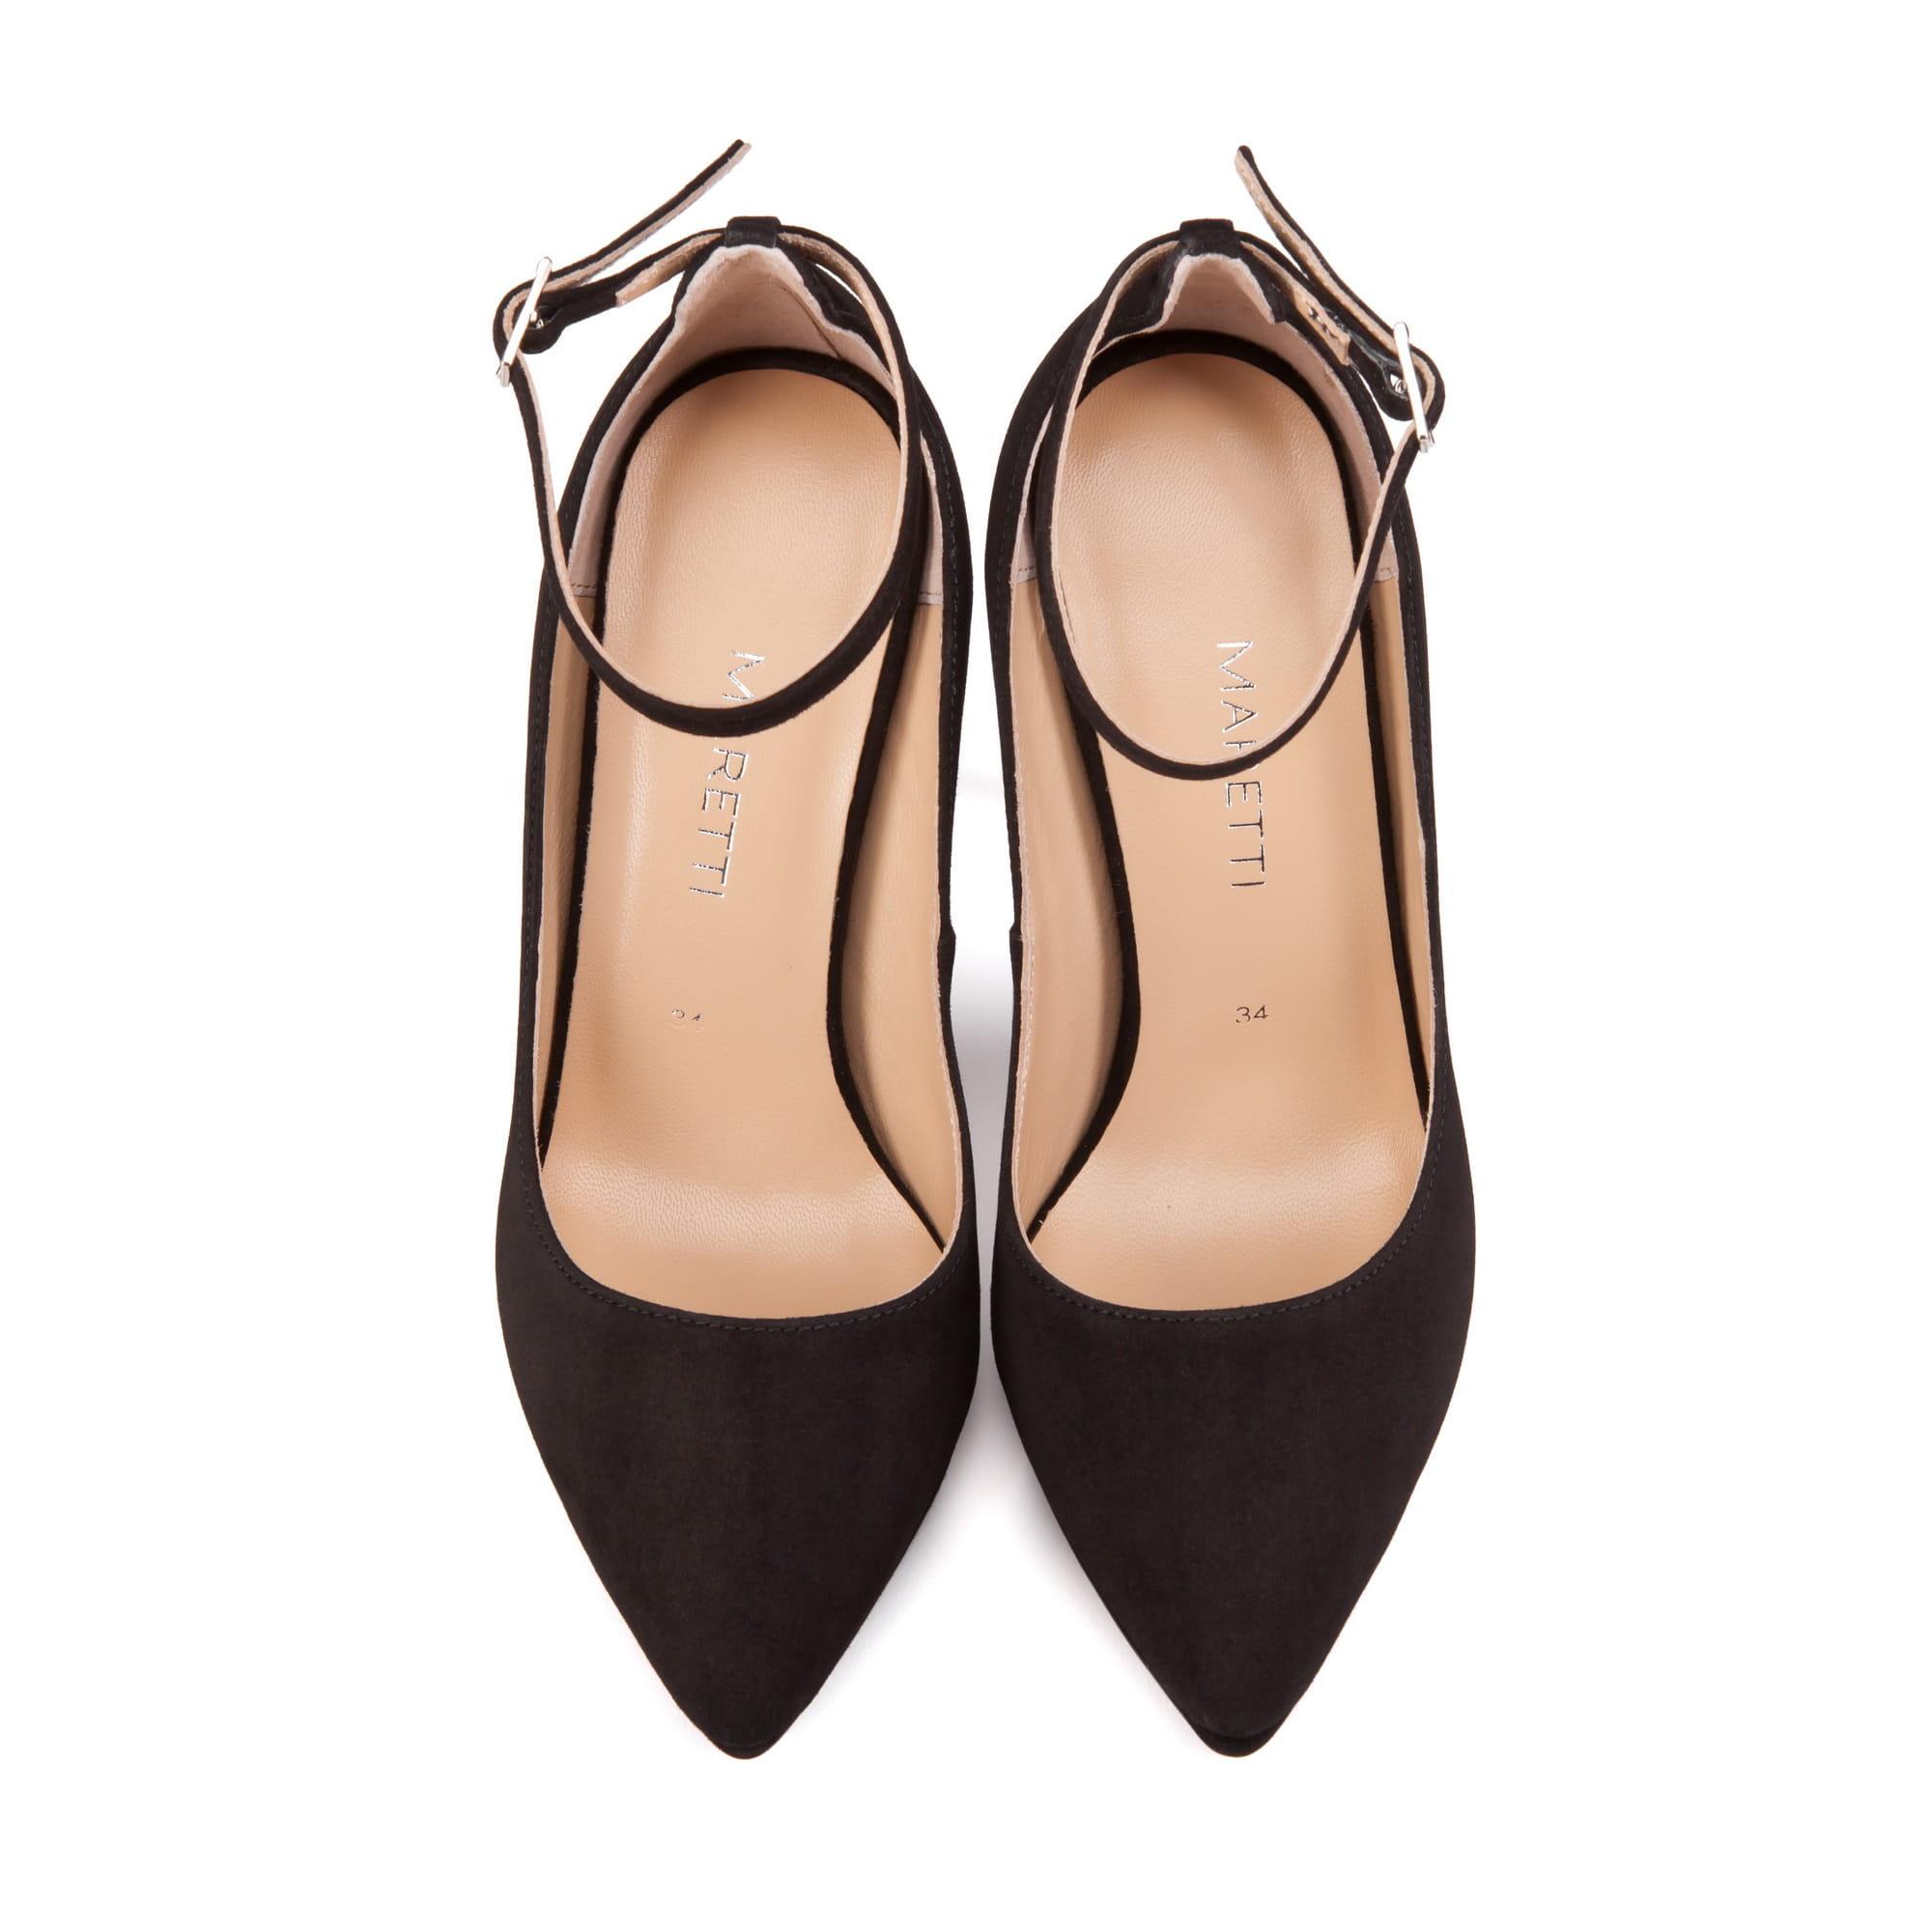 061cbe78 MARETTI PETITE SHOES 1401-16; Małe buty damskie. Małe rozmiary 32-35. MARETTI  PETITE SHOES 1401-16 ...